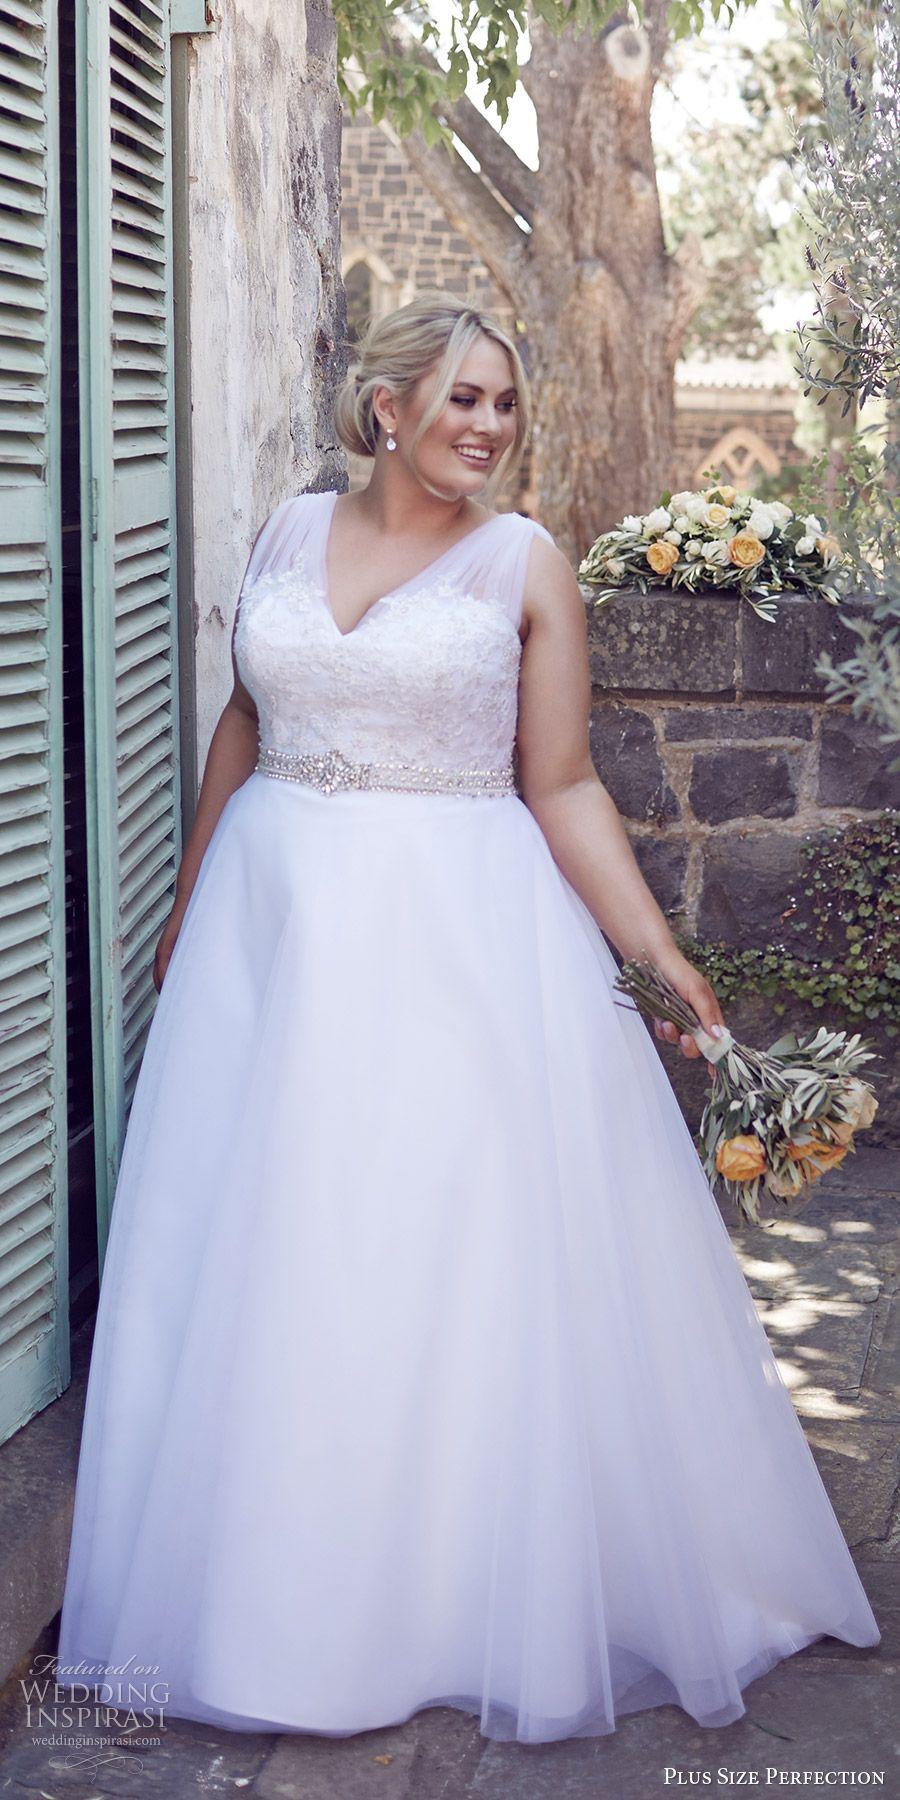 Blue plus size wedding dresses  Plus Size Perfection Wedding Dresses u ucItus A Love Storyud Campaign